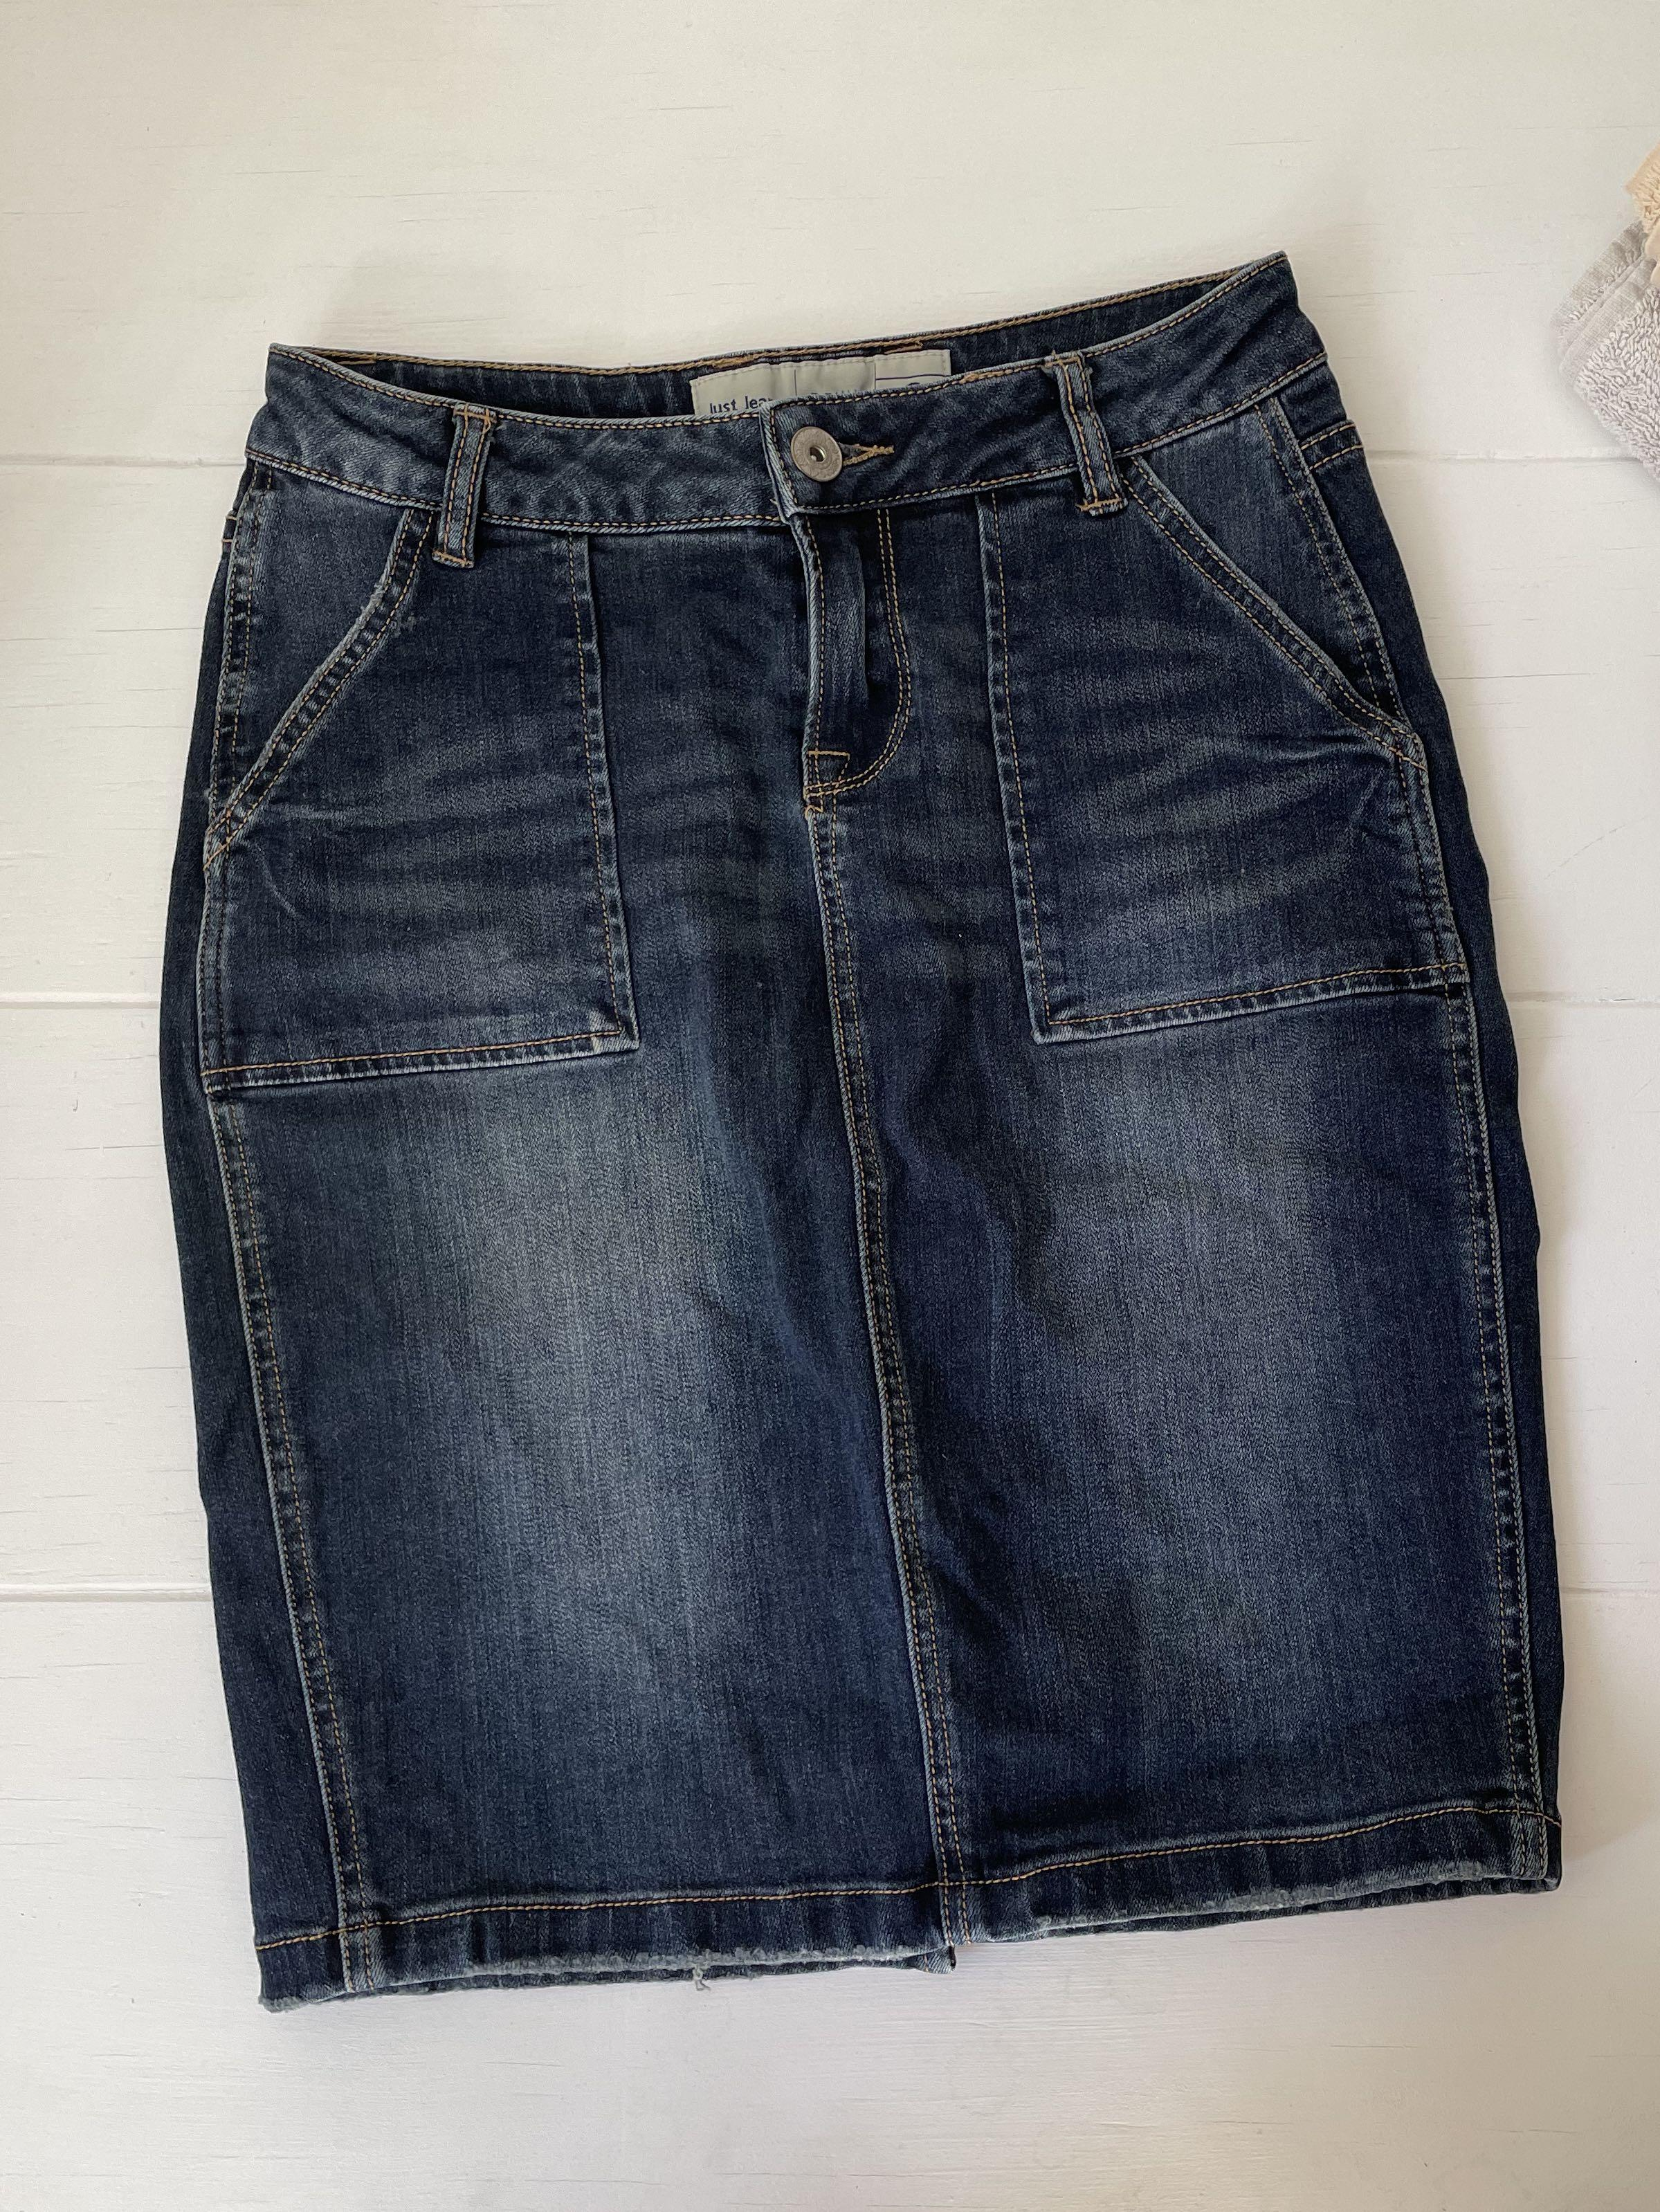 Just Jean Denim Skirt